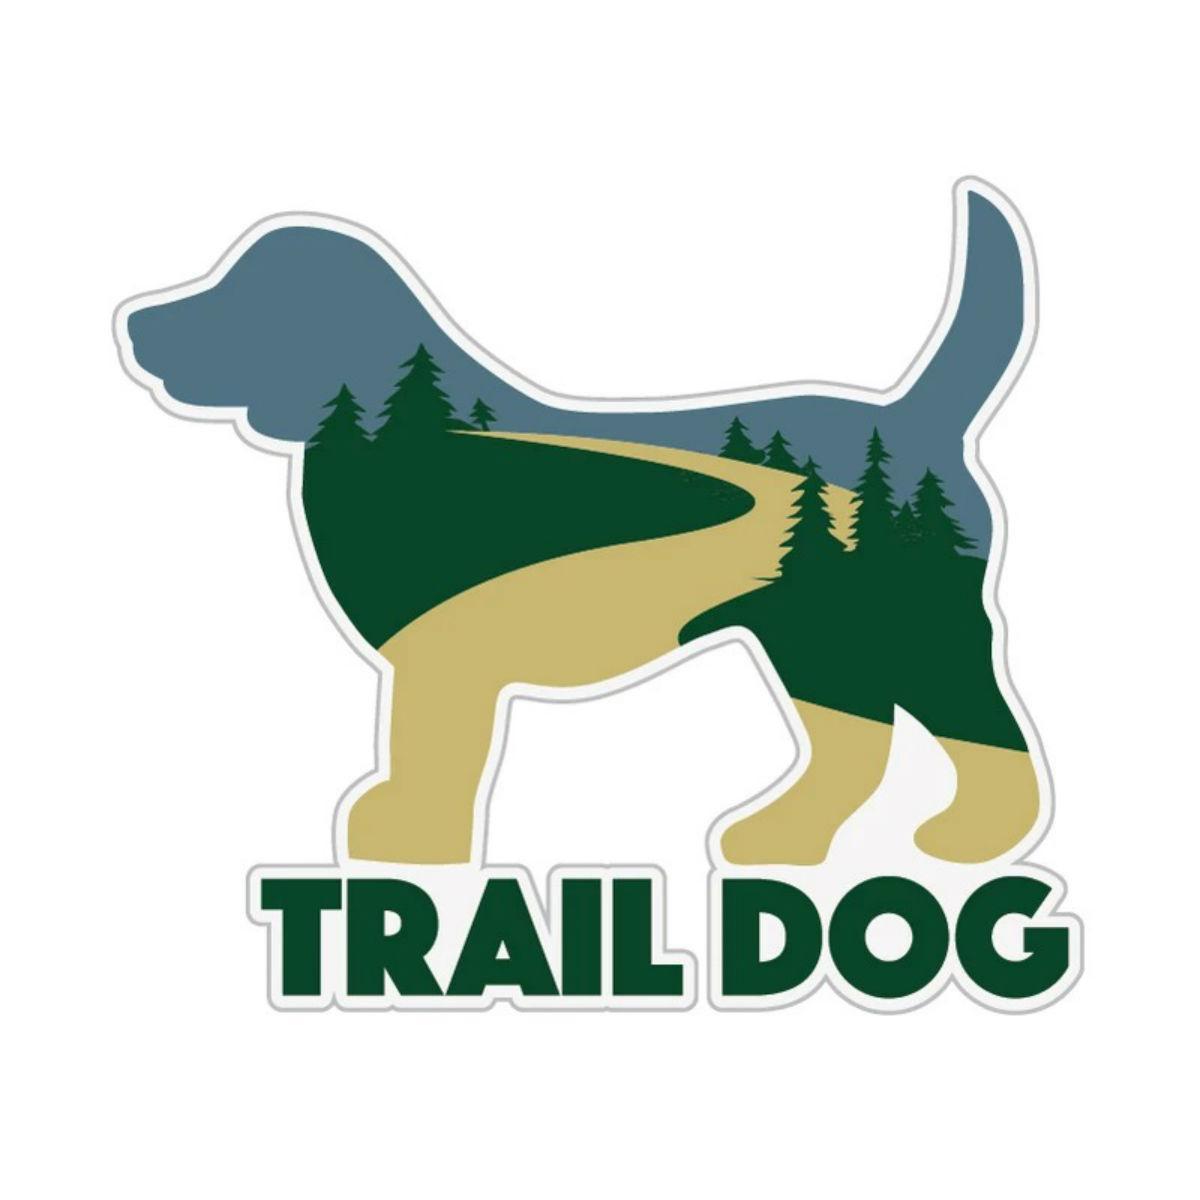 Trail Dog Sticker by Dog Speak